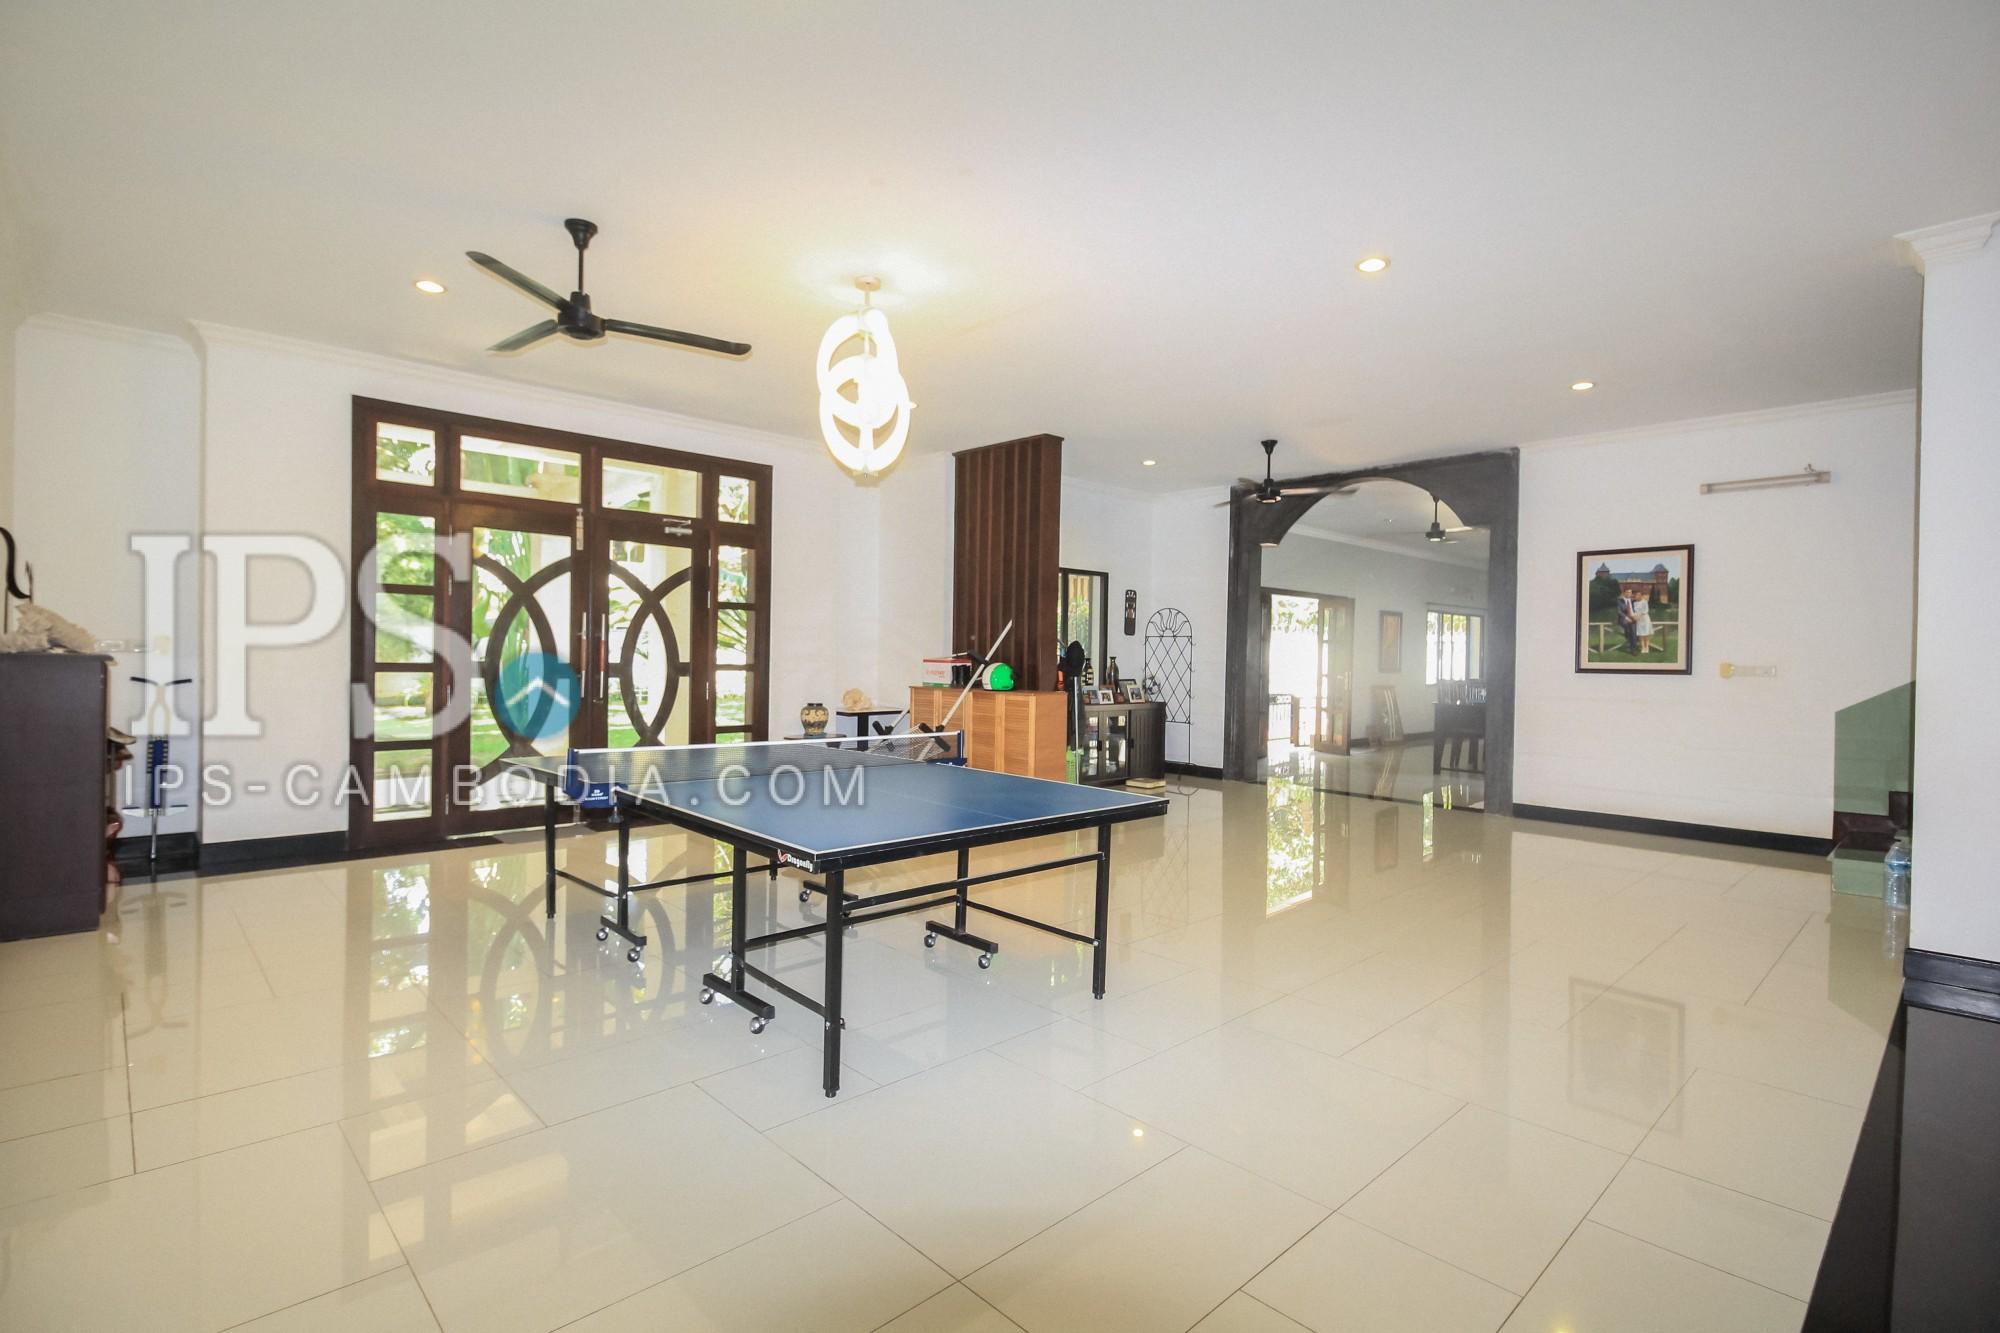 5 Bedroom Villa for Rent - Siem Reap